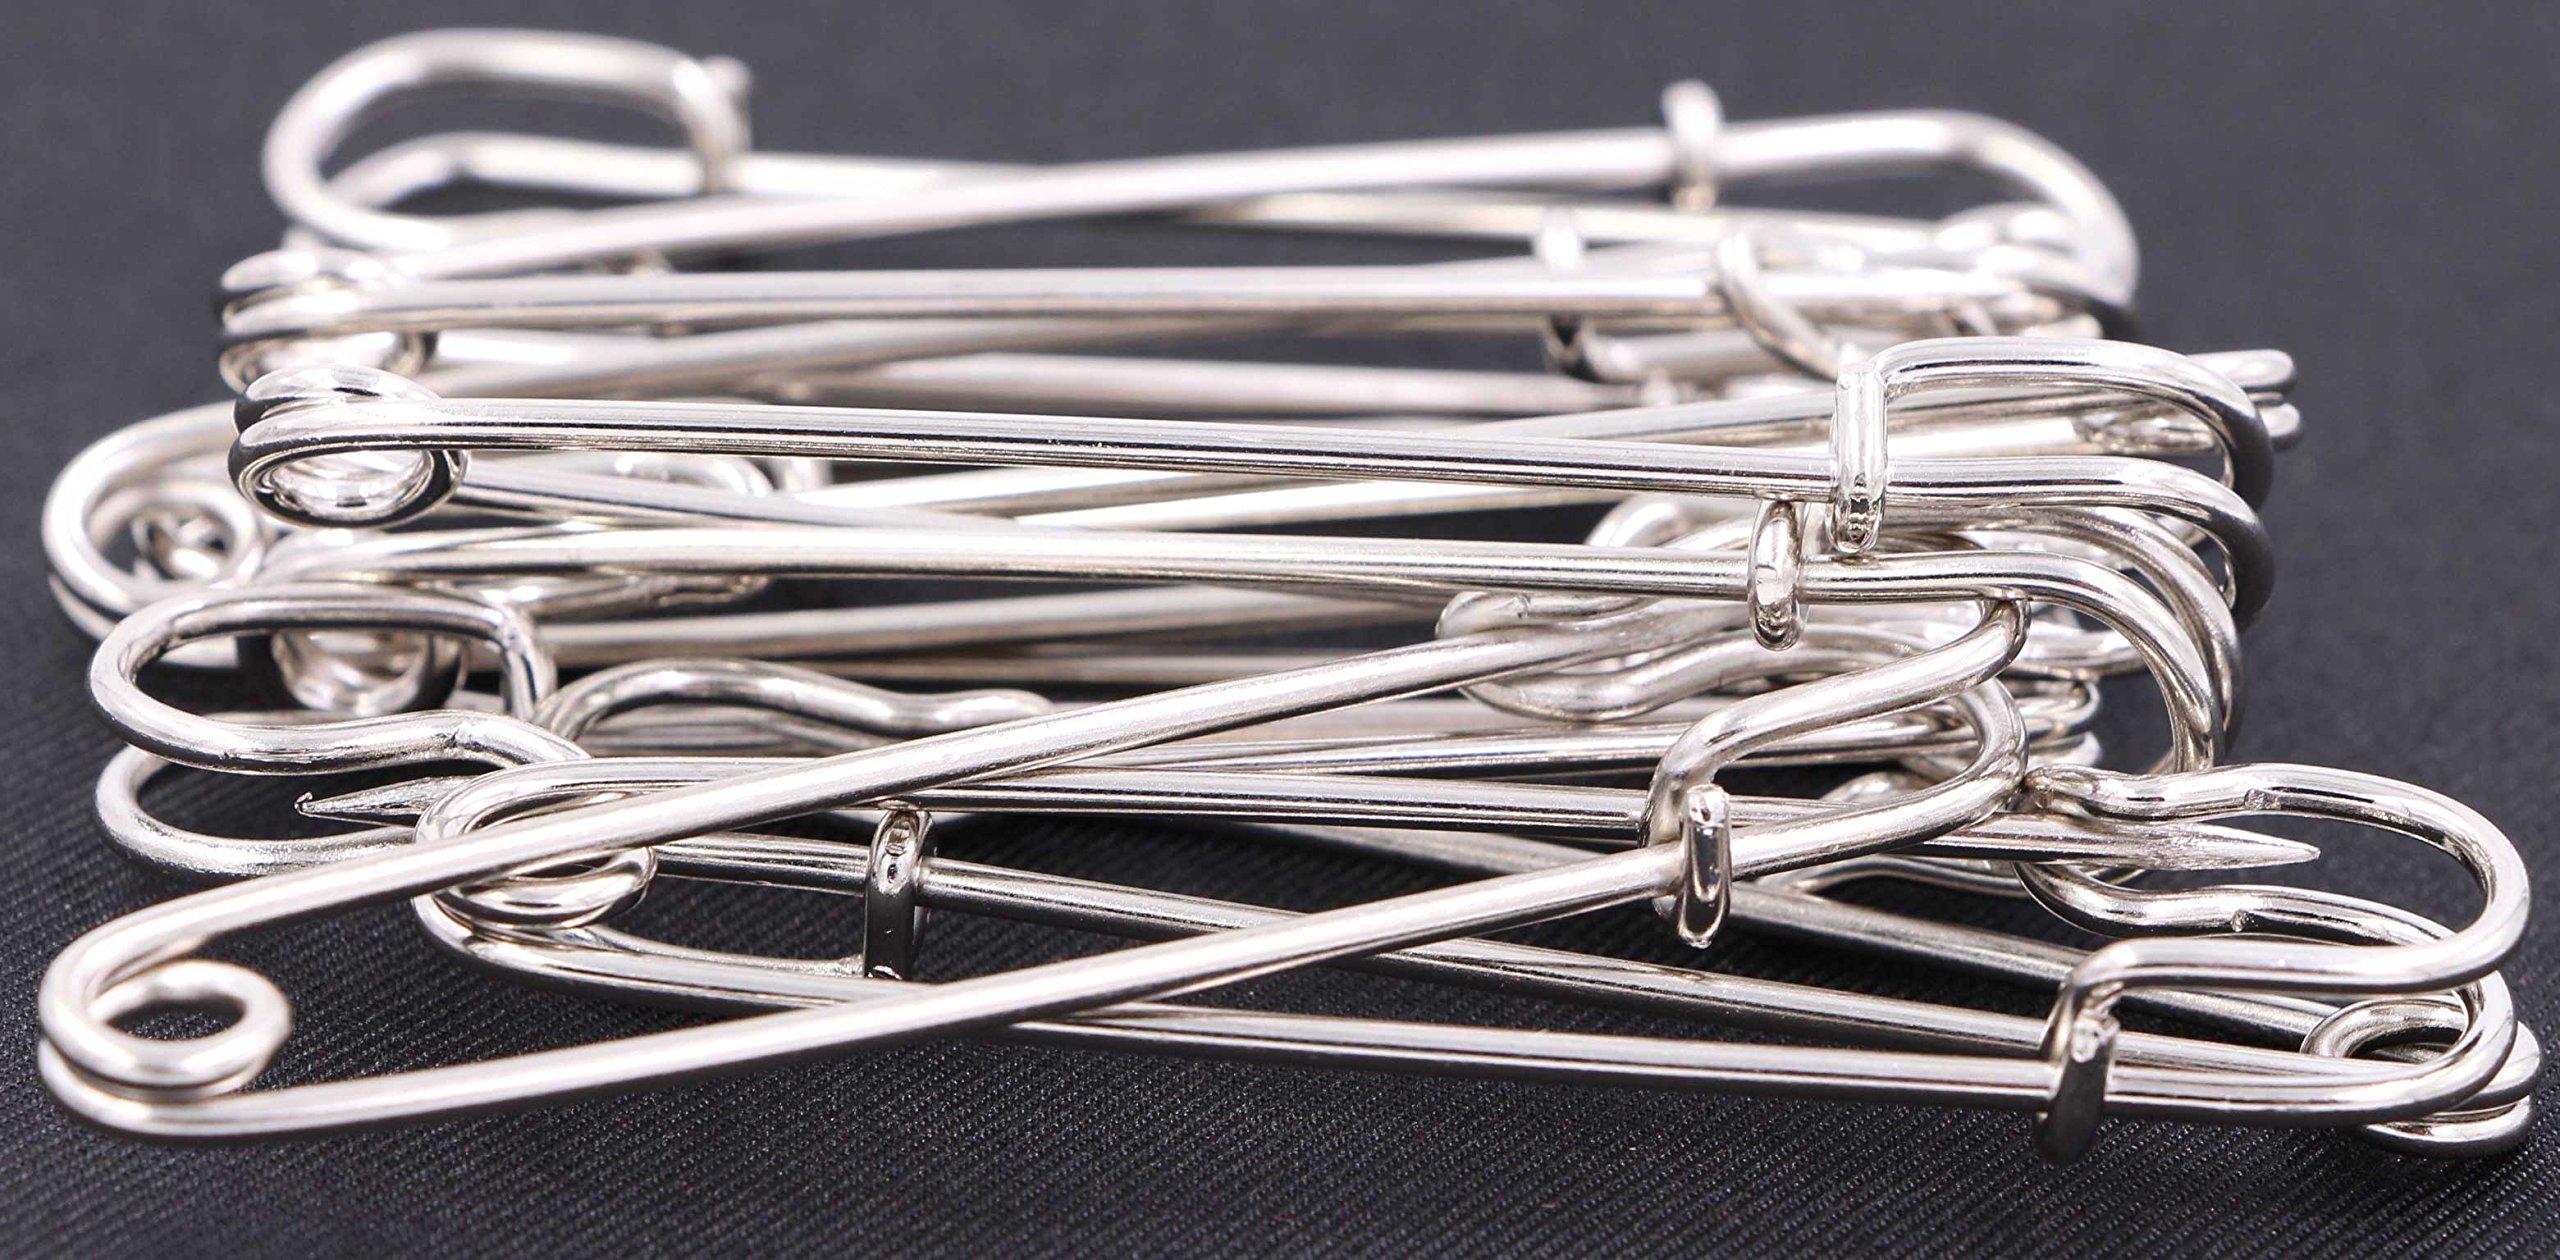 Enkaustikos Beaded Safety Edge 2 oz Empty Metal Cup 2-1//4 inch x 3//4 inch deep